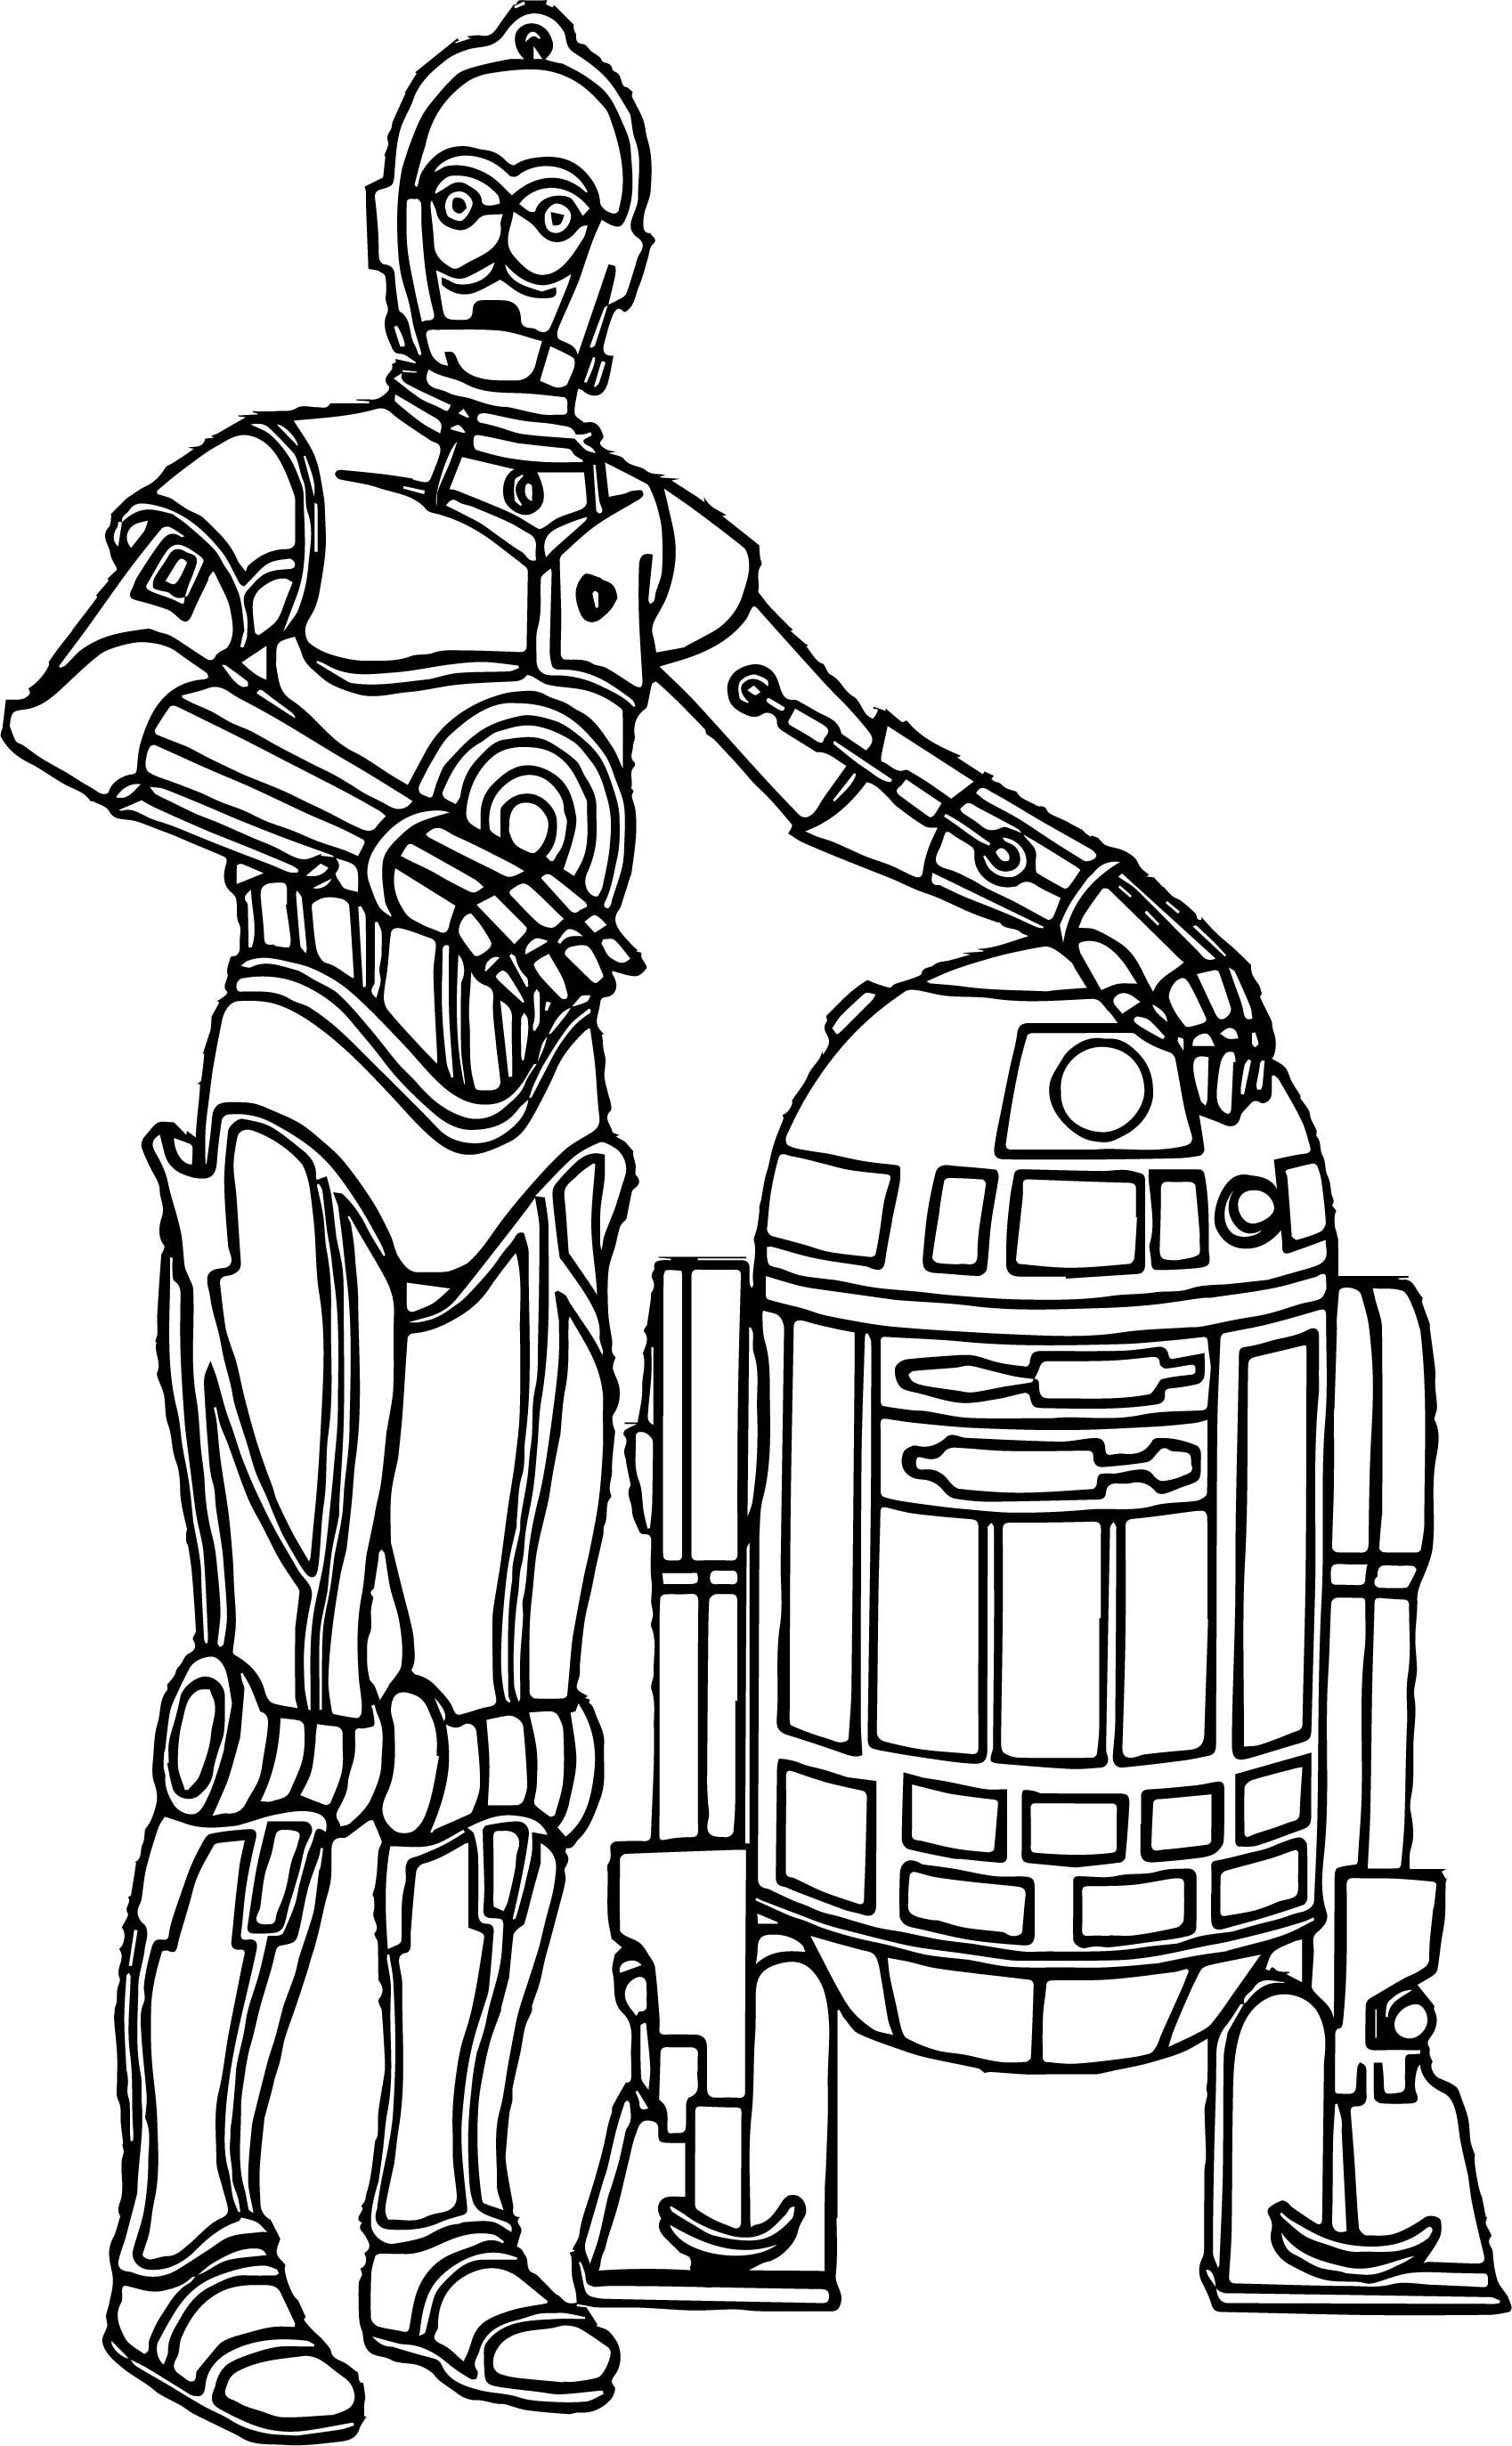 Star Wars The Force Awakens Robot